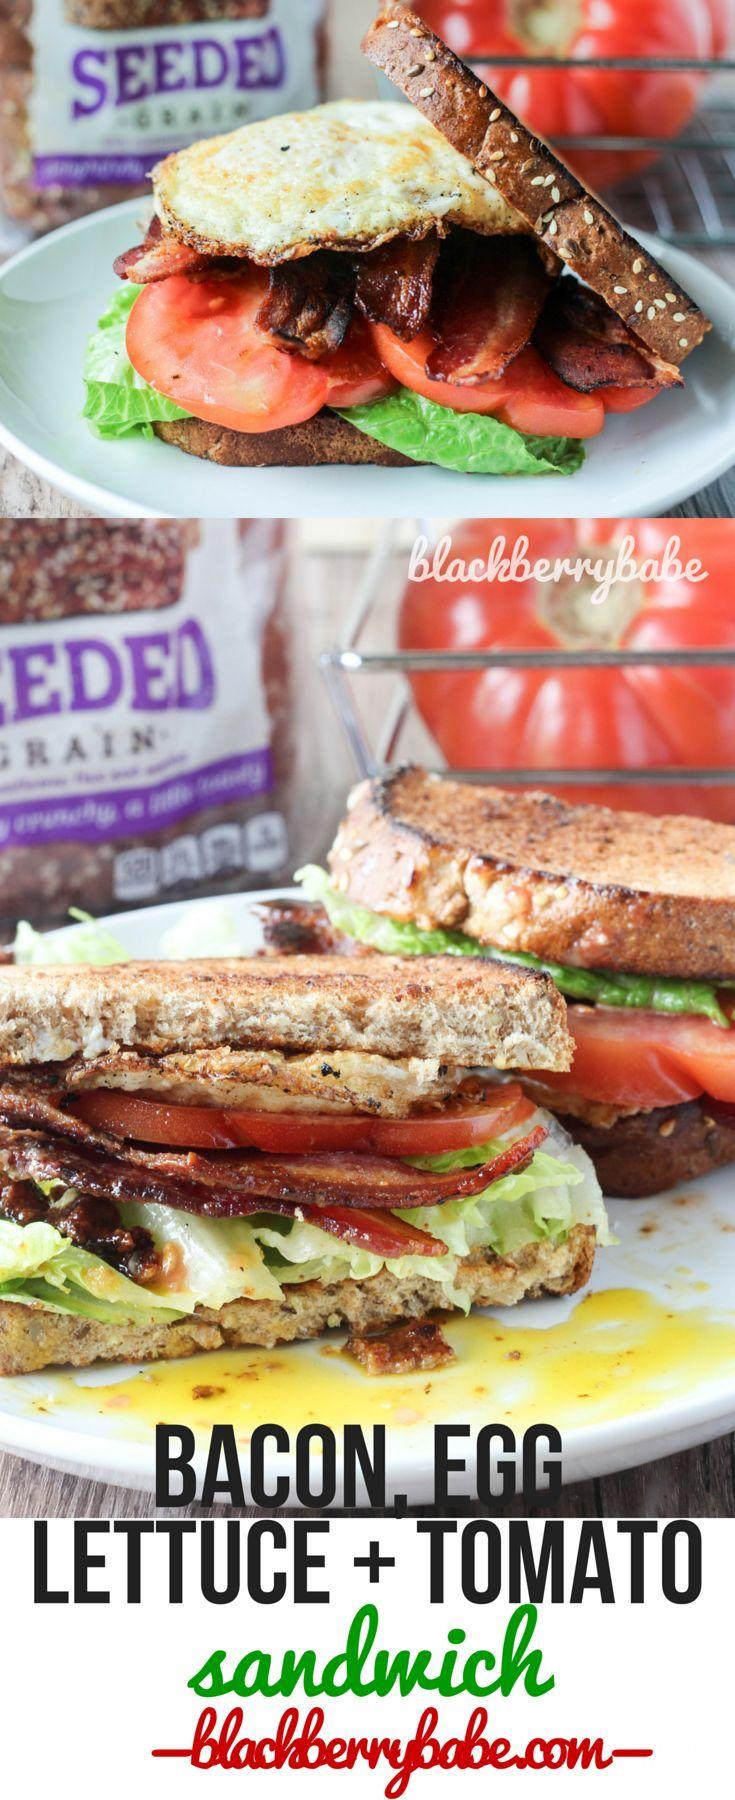 BELT Sandwich- Bacon, Egg, Lettuce and Tomato Sandwich - Blackberry Babe Bacon Egg Lettuce and Toma